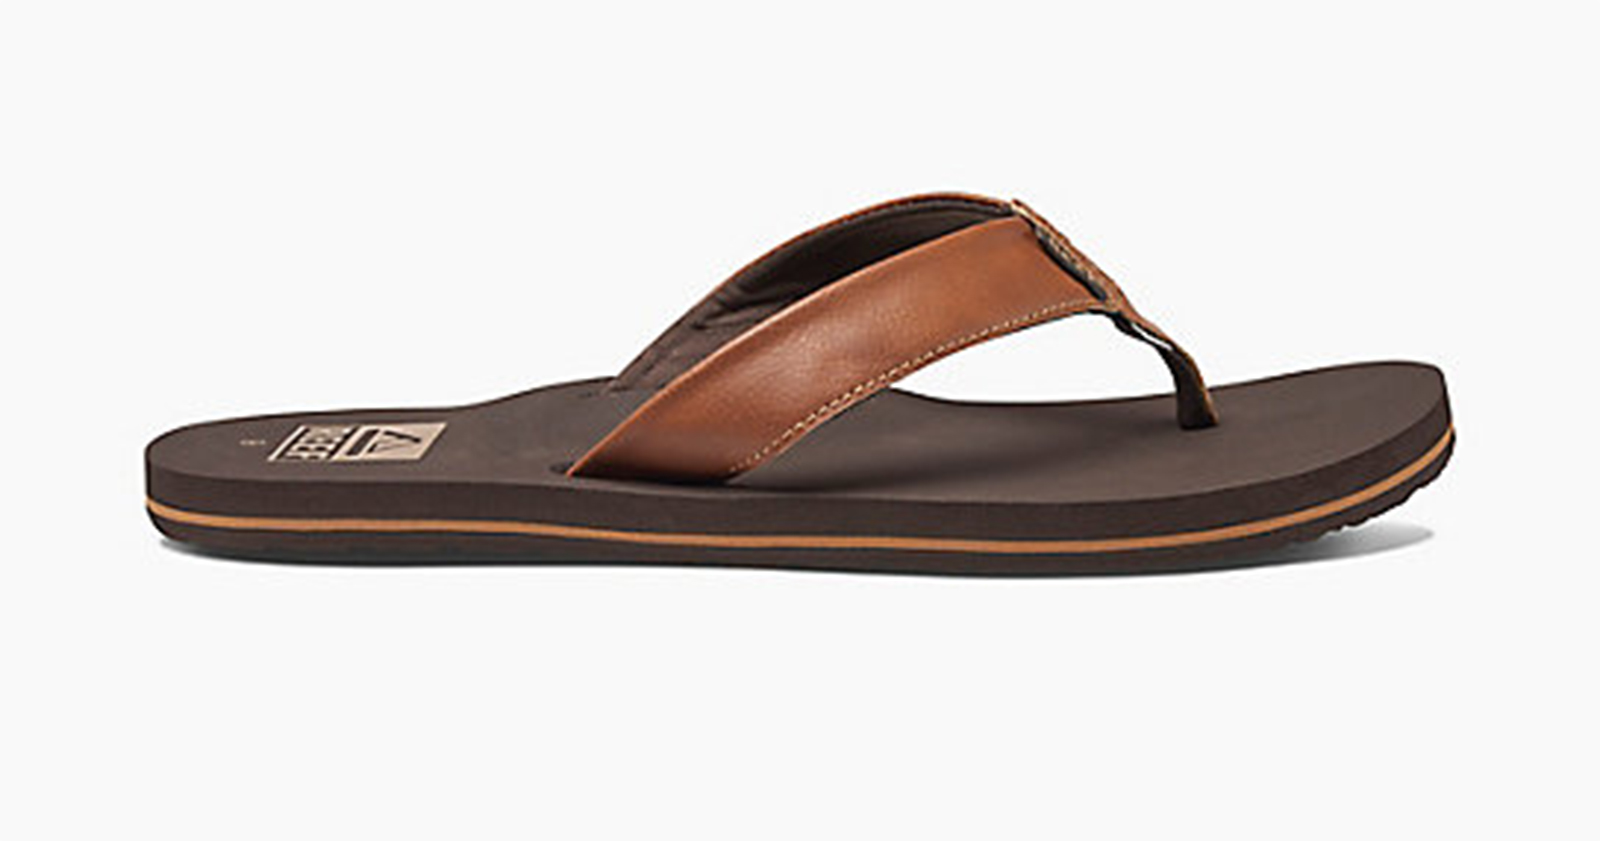 63ba3ff790ba ... Brown vegan leather flip-flops with EVA soles - REEF TWINPIN BROWN ...